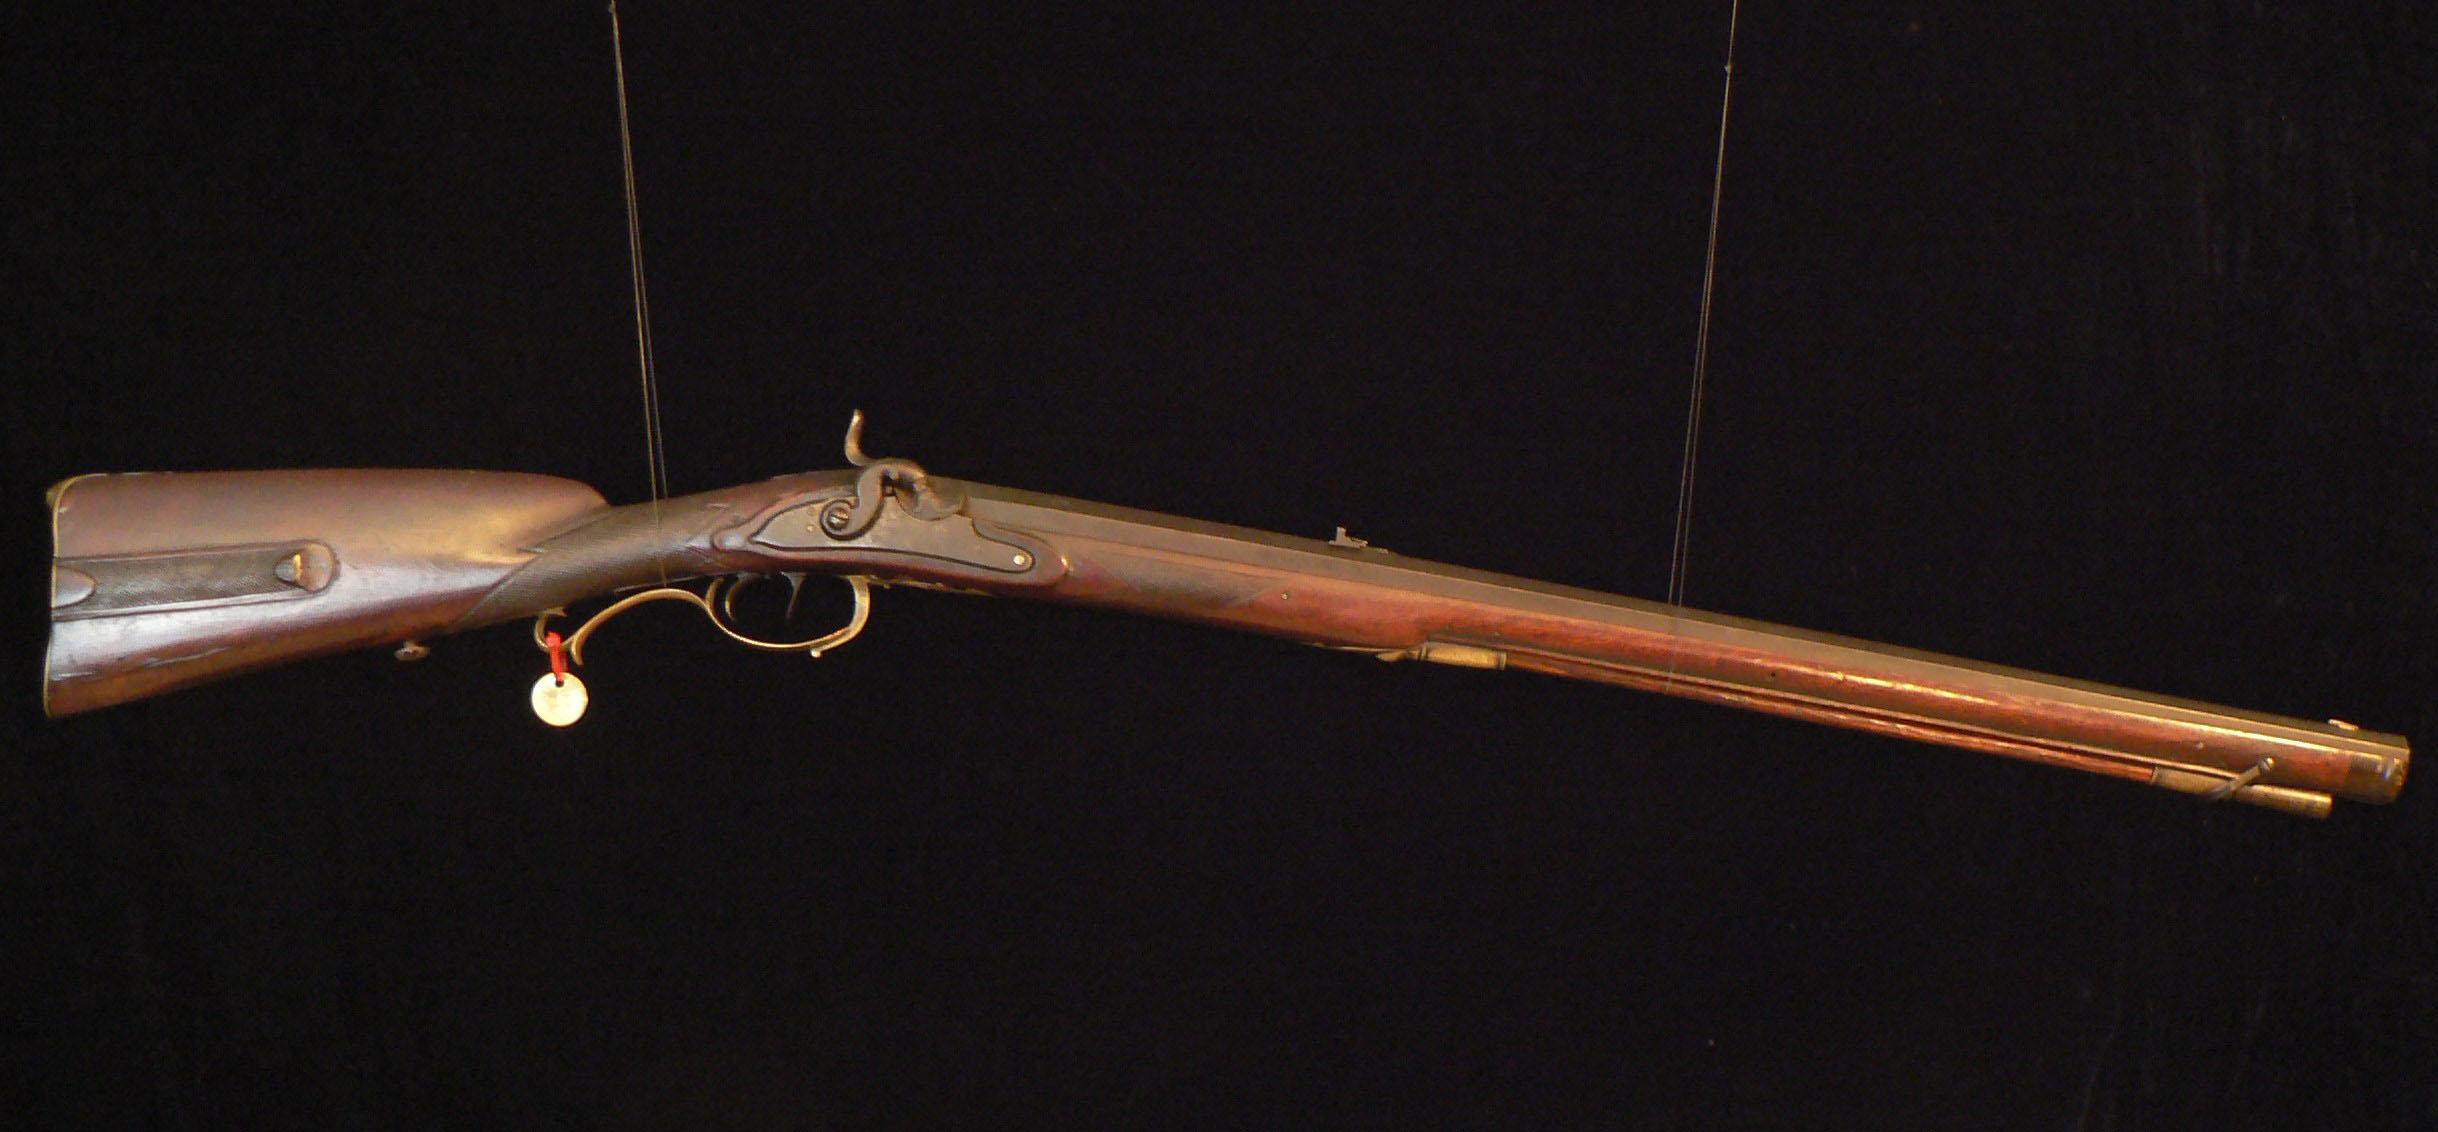 Jaeger Rifle Recreating History